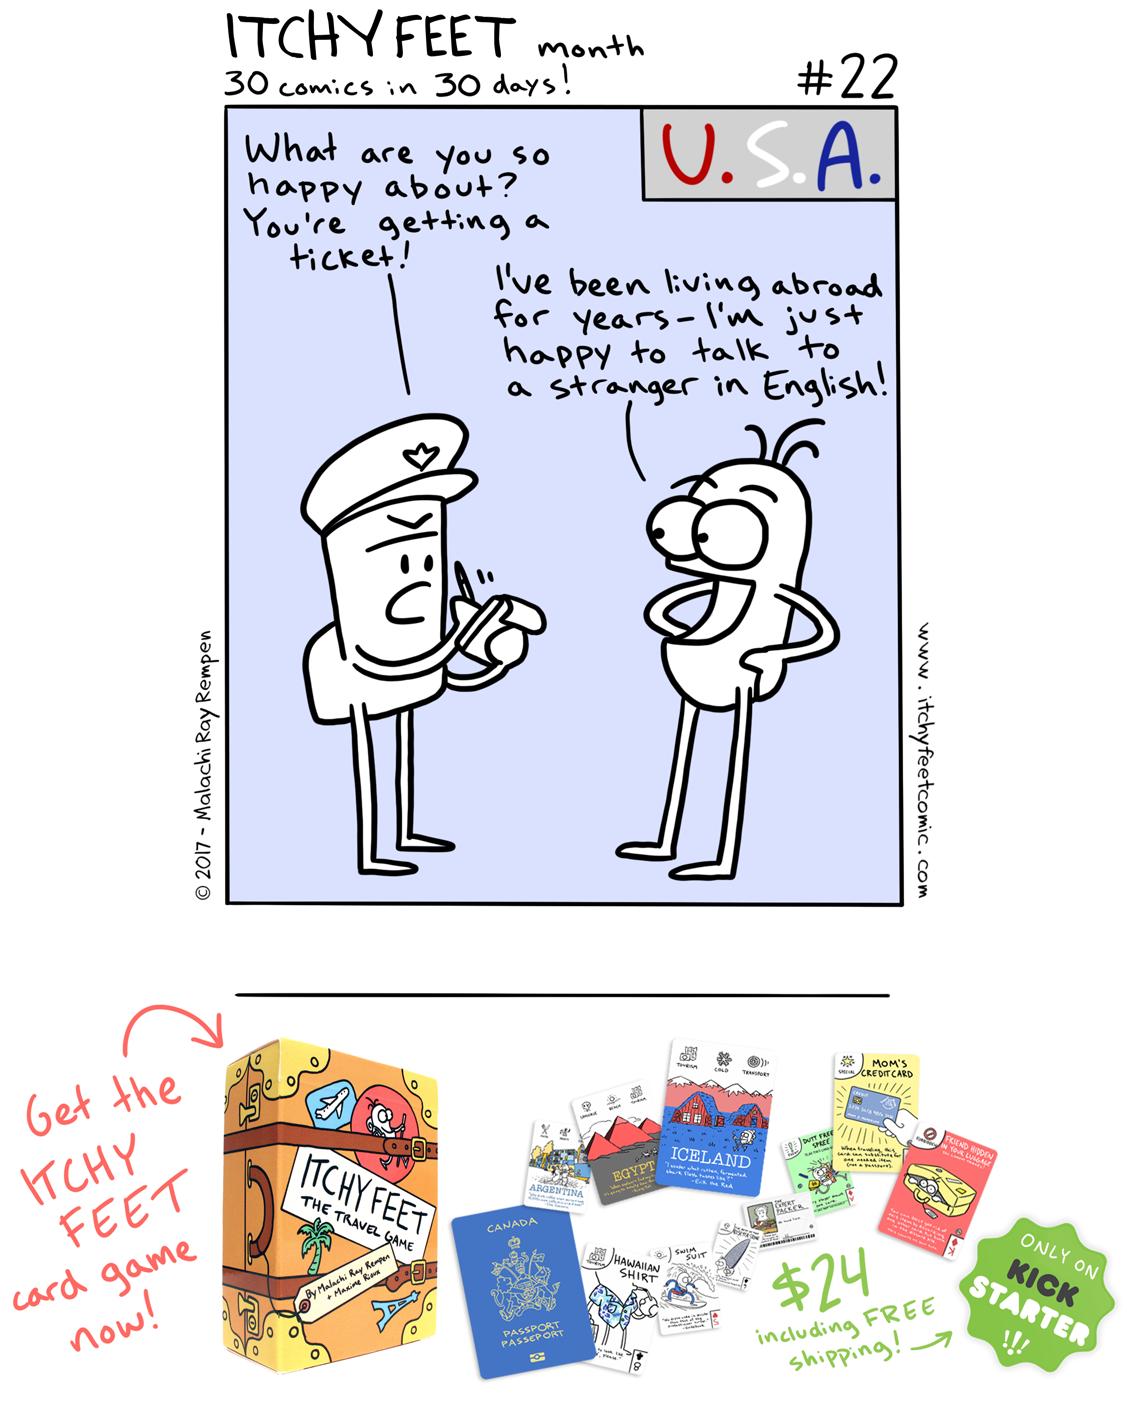 speak english america usa